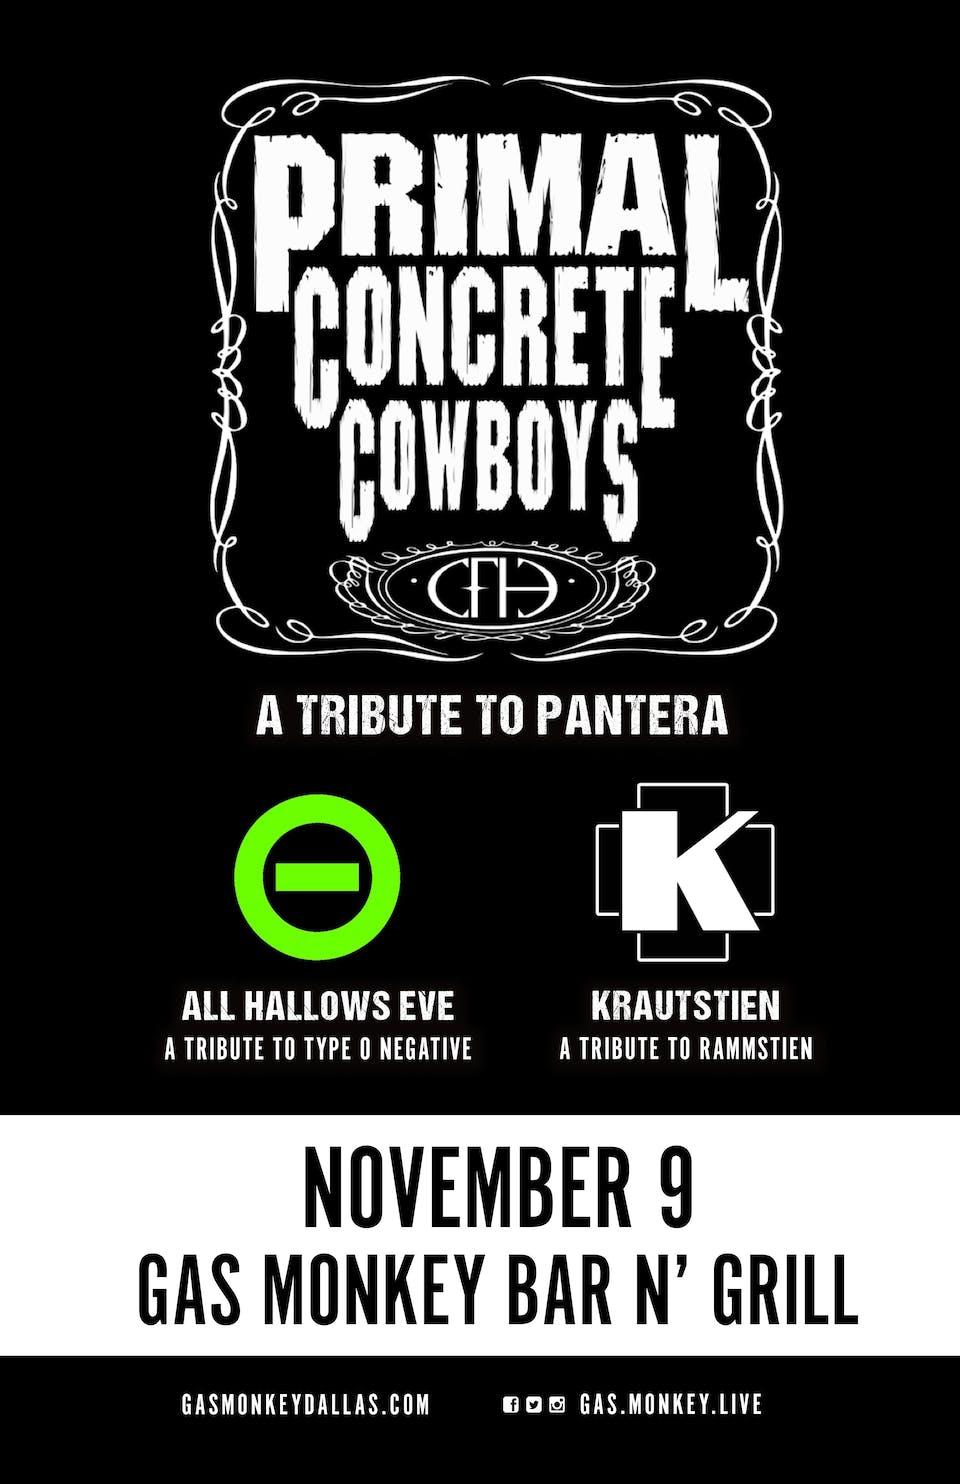 Primal Concrete Cowboys (Pantera Tribute) + ALL HALLOWS EVE(Type O Tribute)